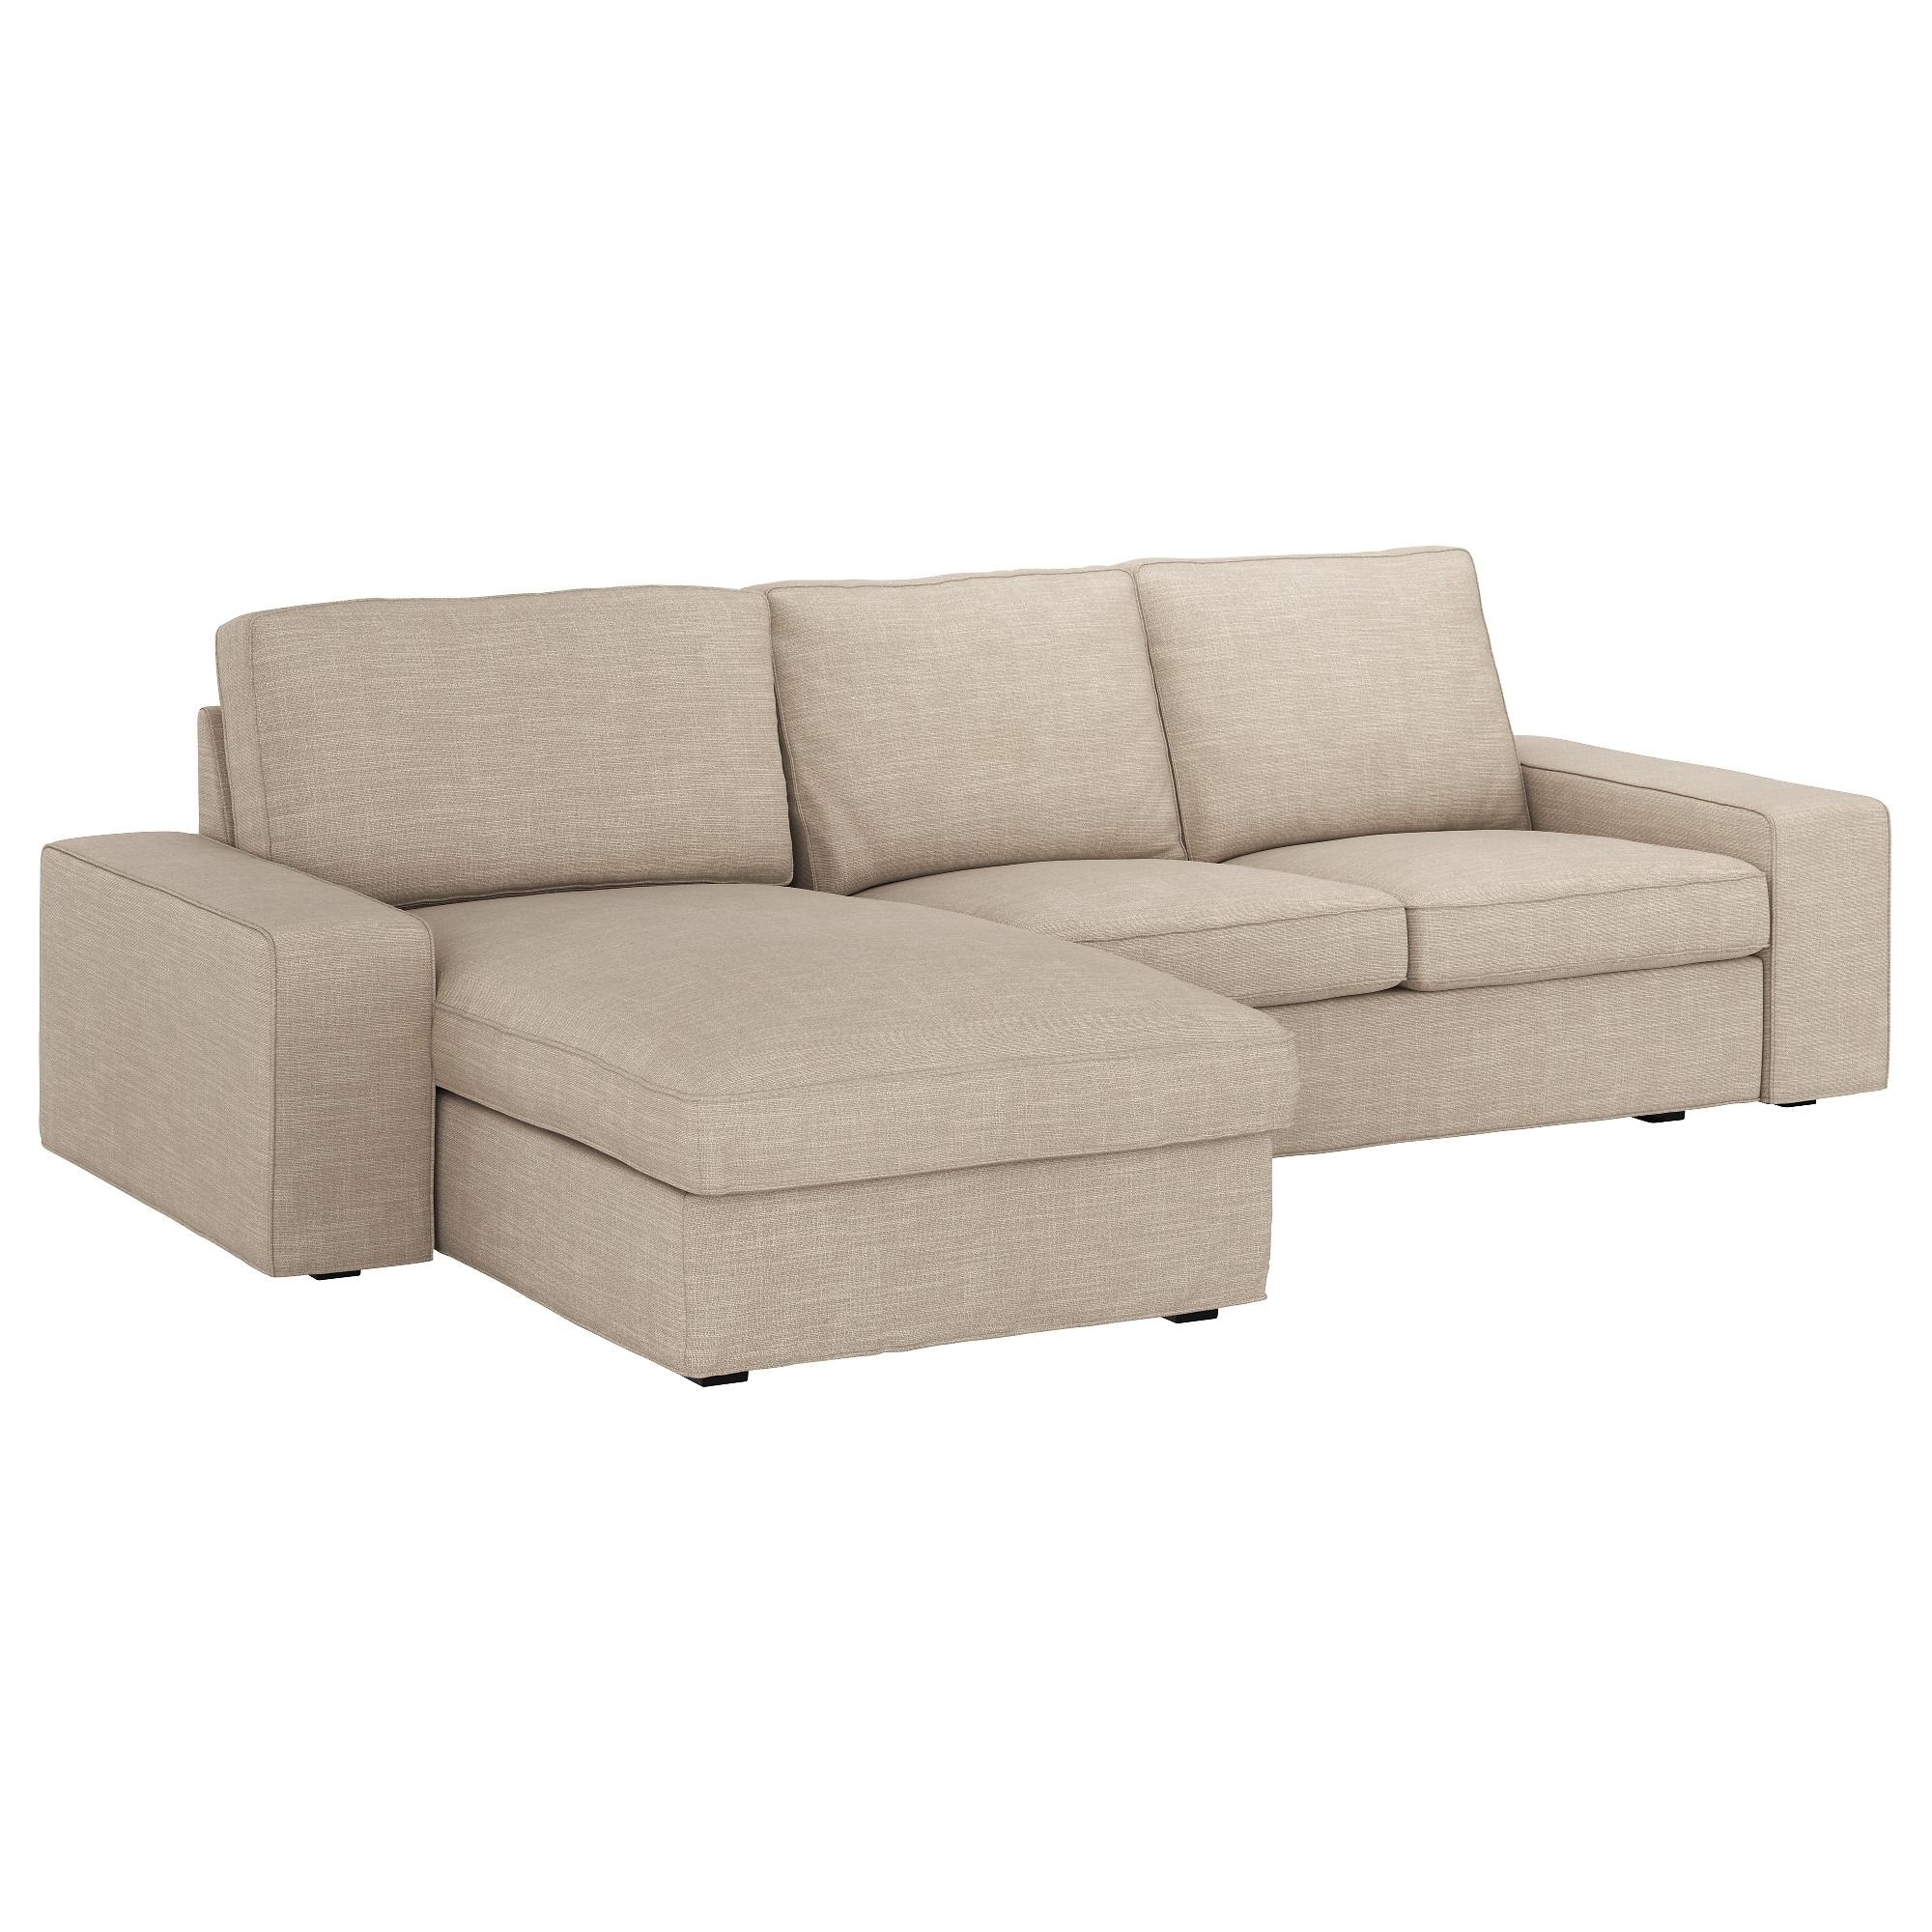 kivik sofa chaise microfiber contemporary ikea with home the honoroak